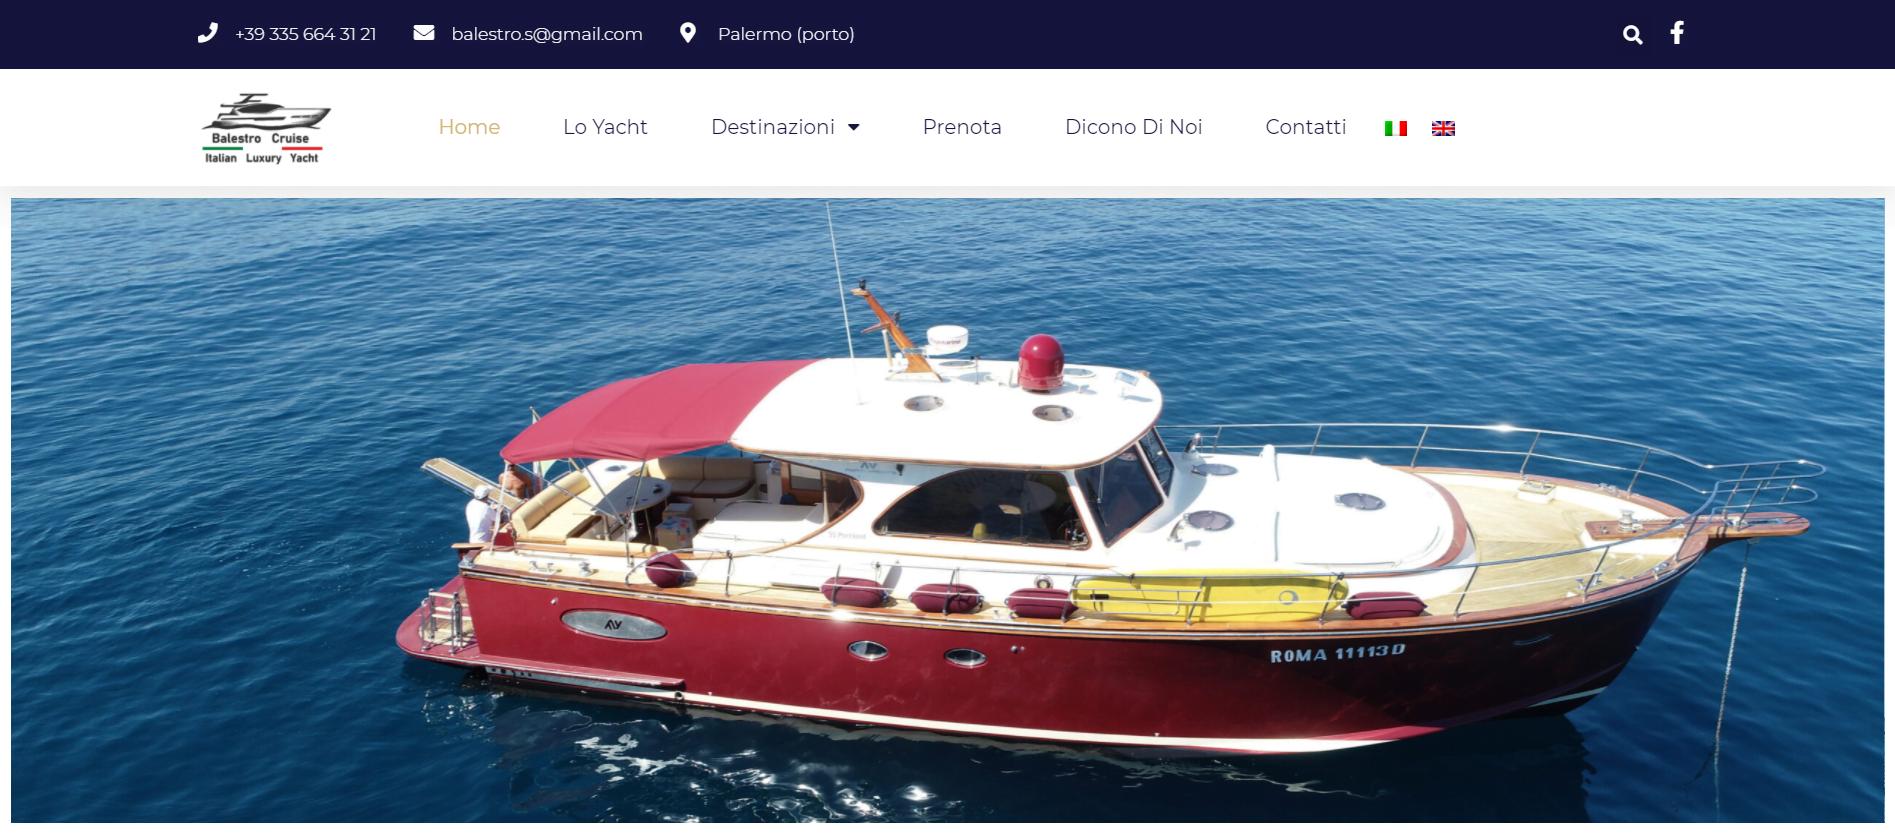 Noleggio Yacht Balestro Cruise